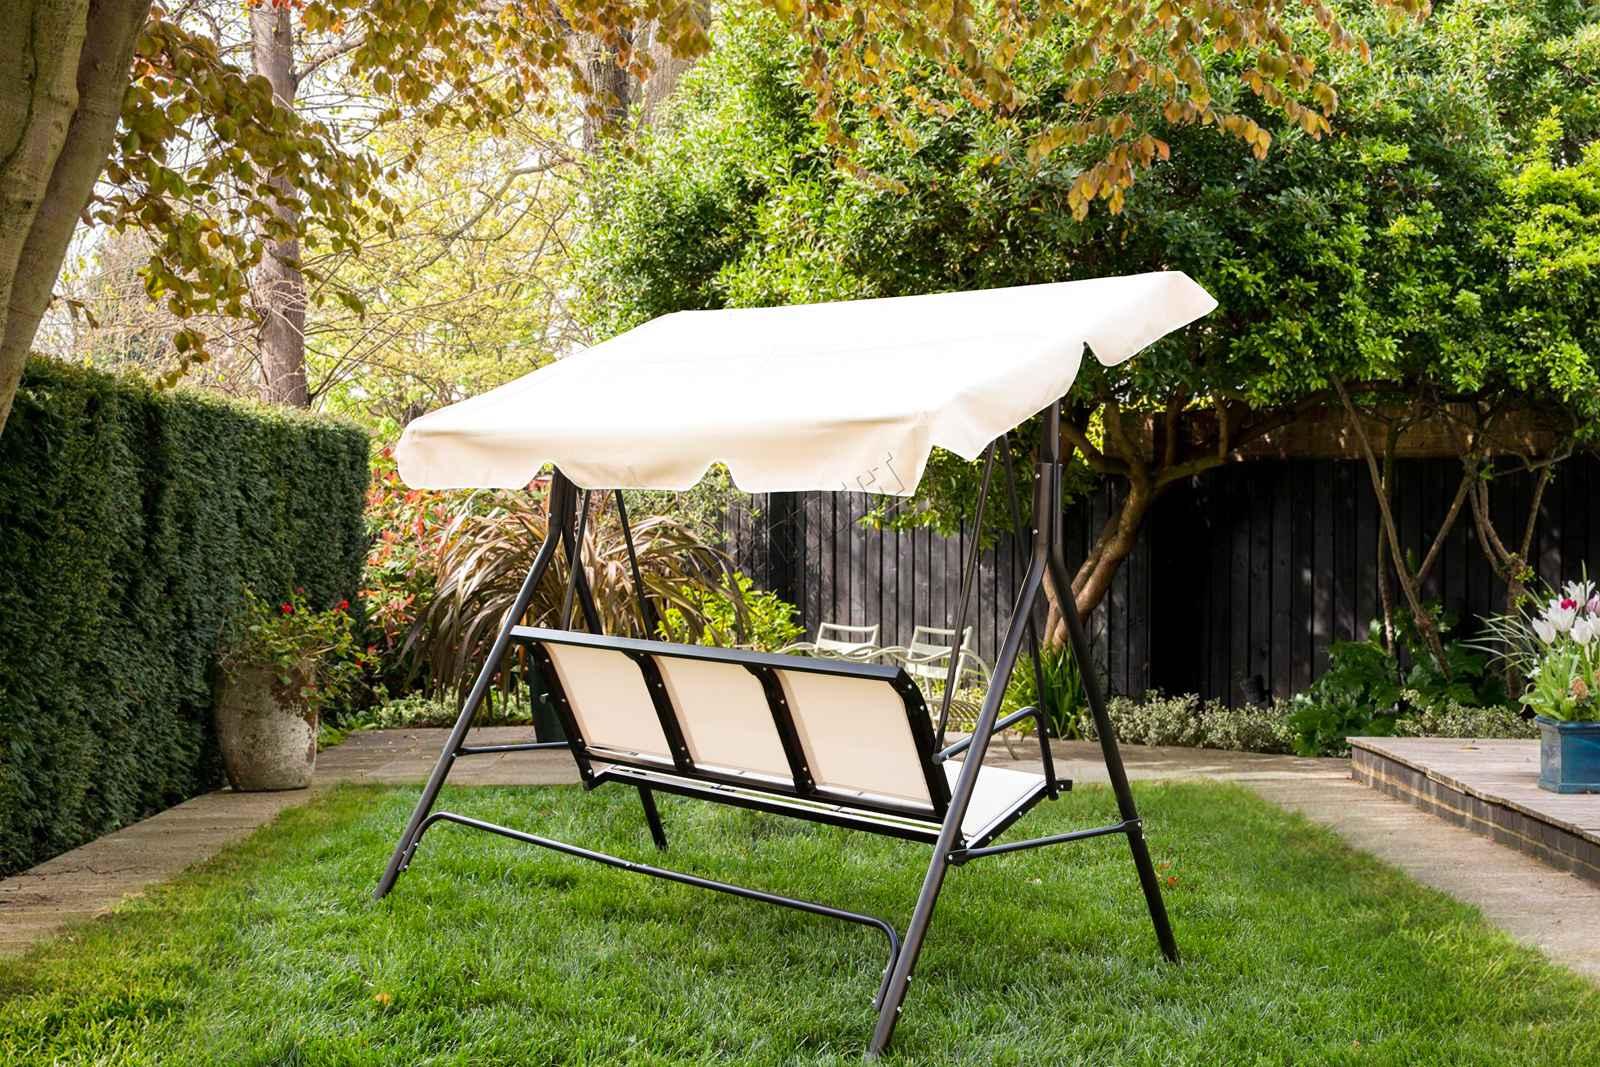 swing chair metal stool room foxhunter garden hammock 3 seater bench